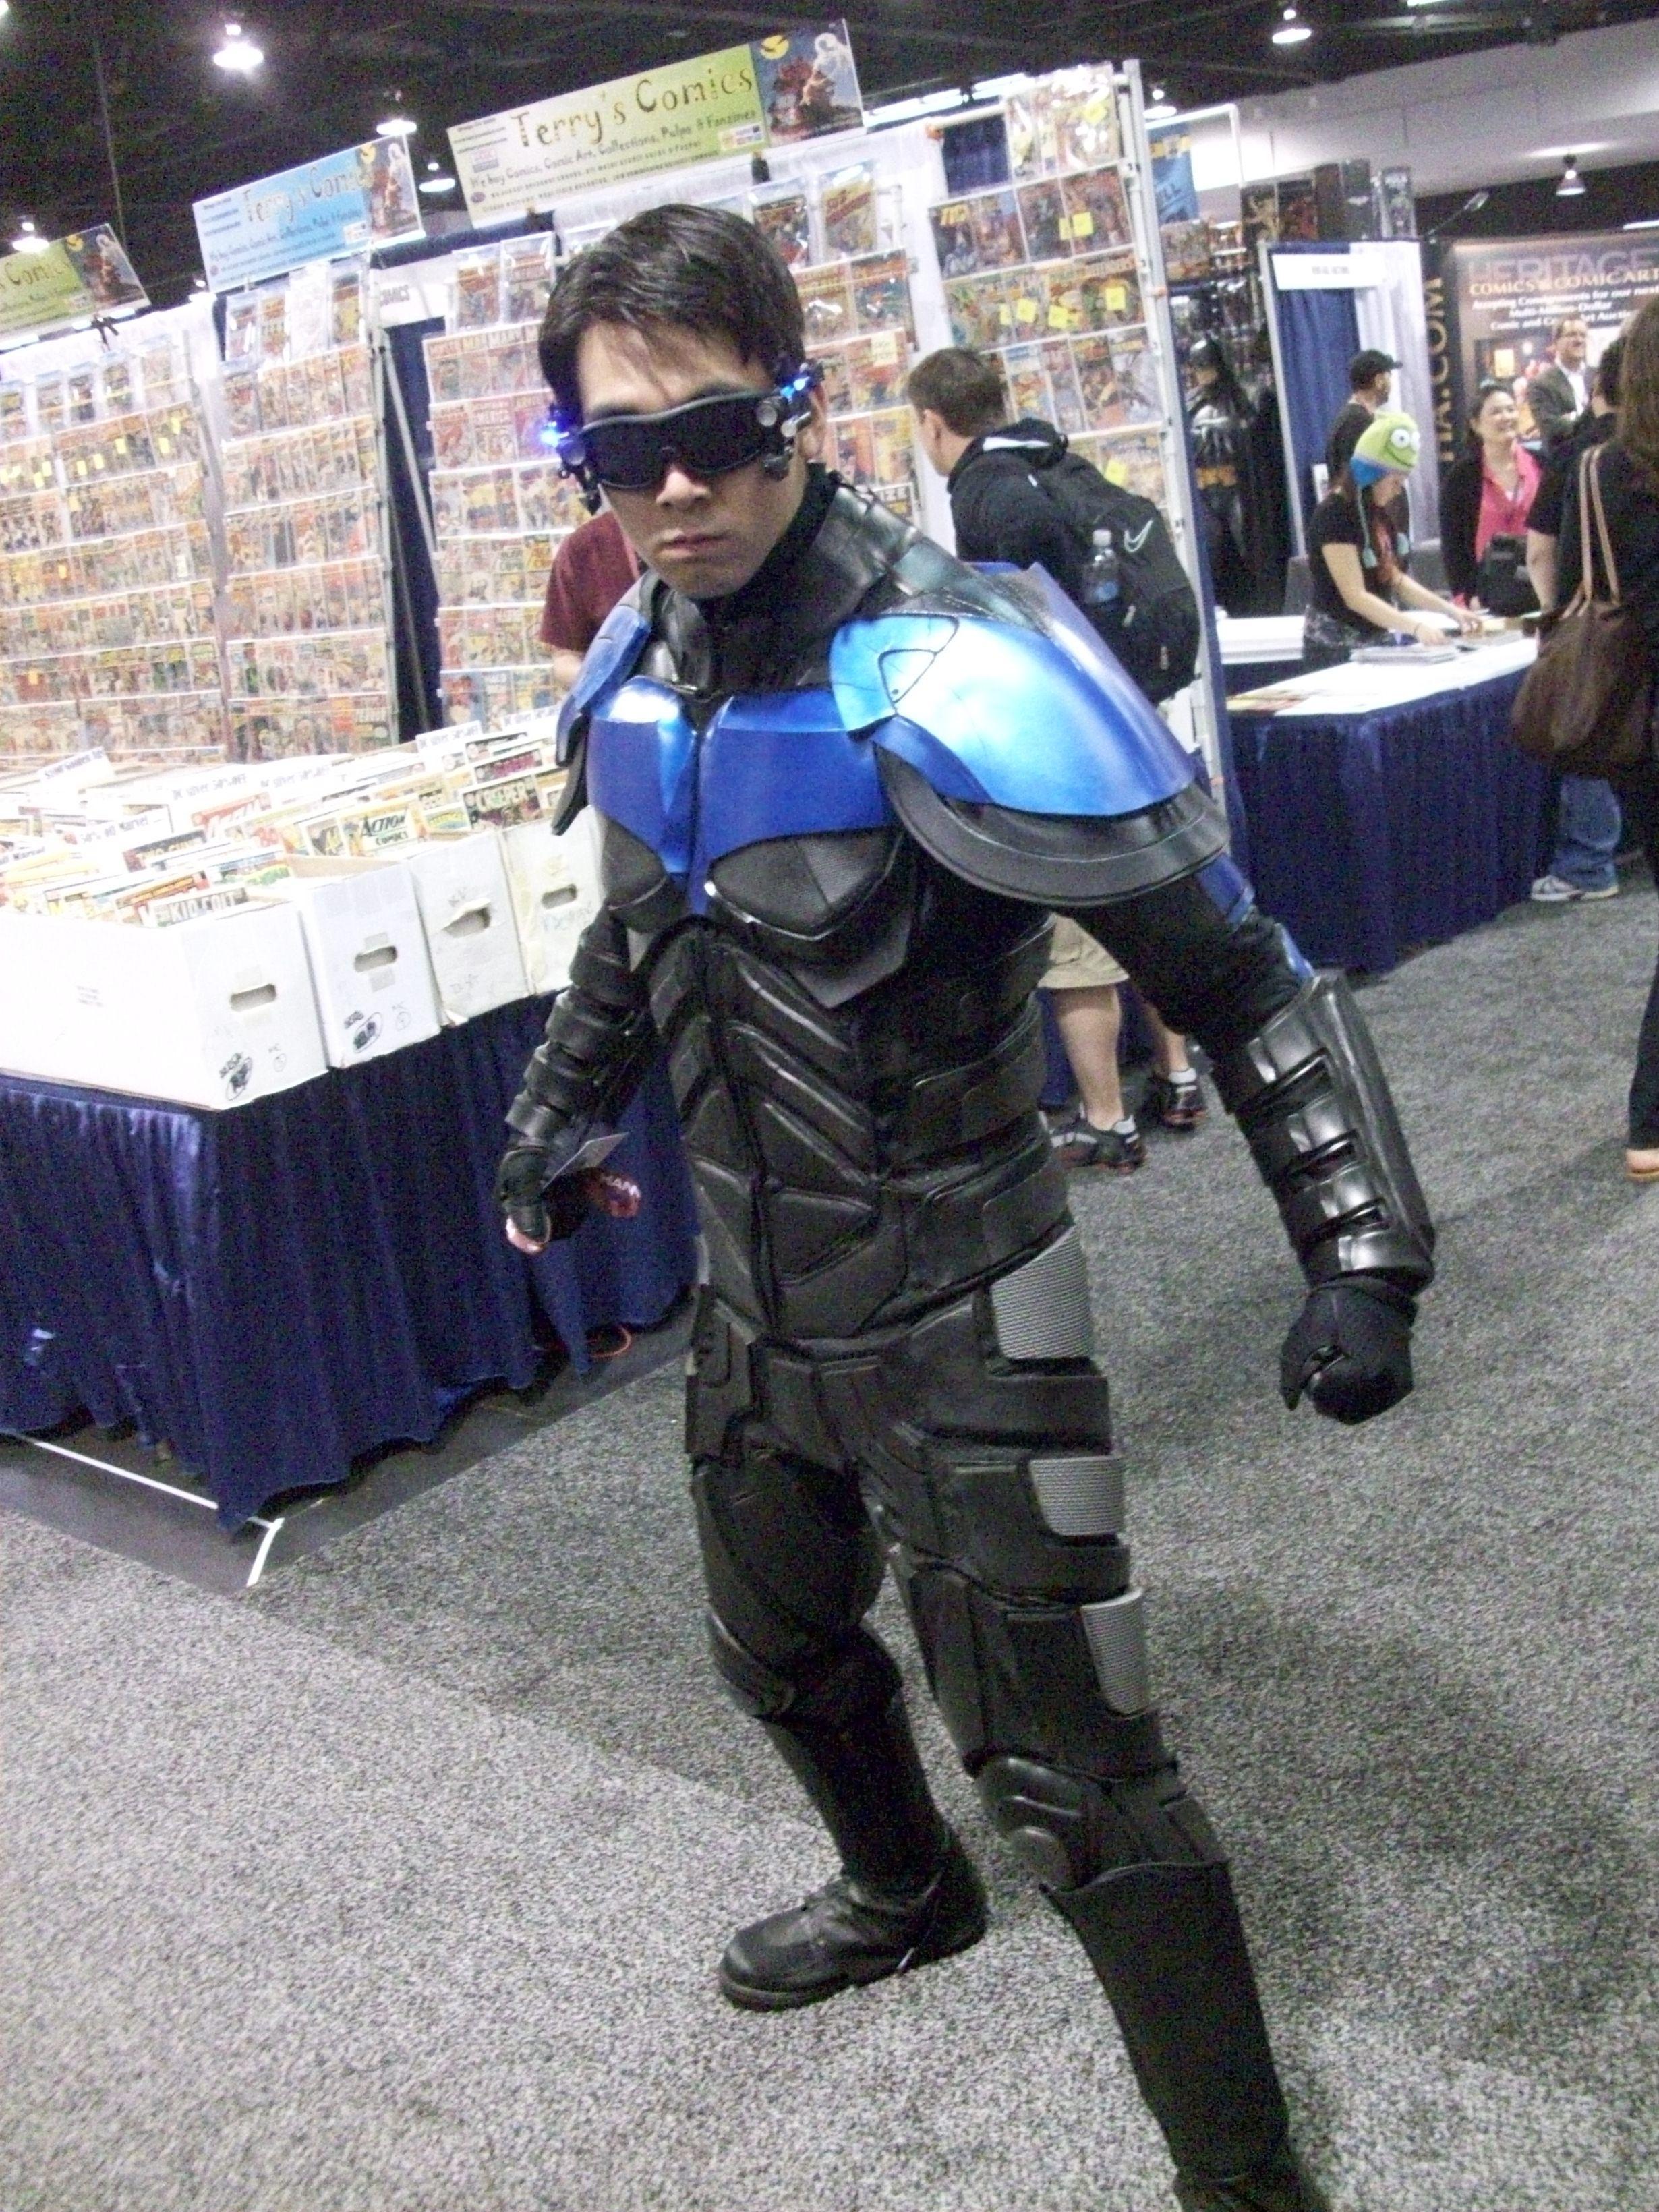 Armored Nightwing | Nightwing Costuming Ideas | Pinterest | Nightwing